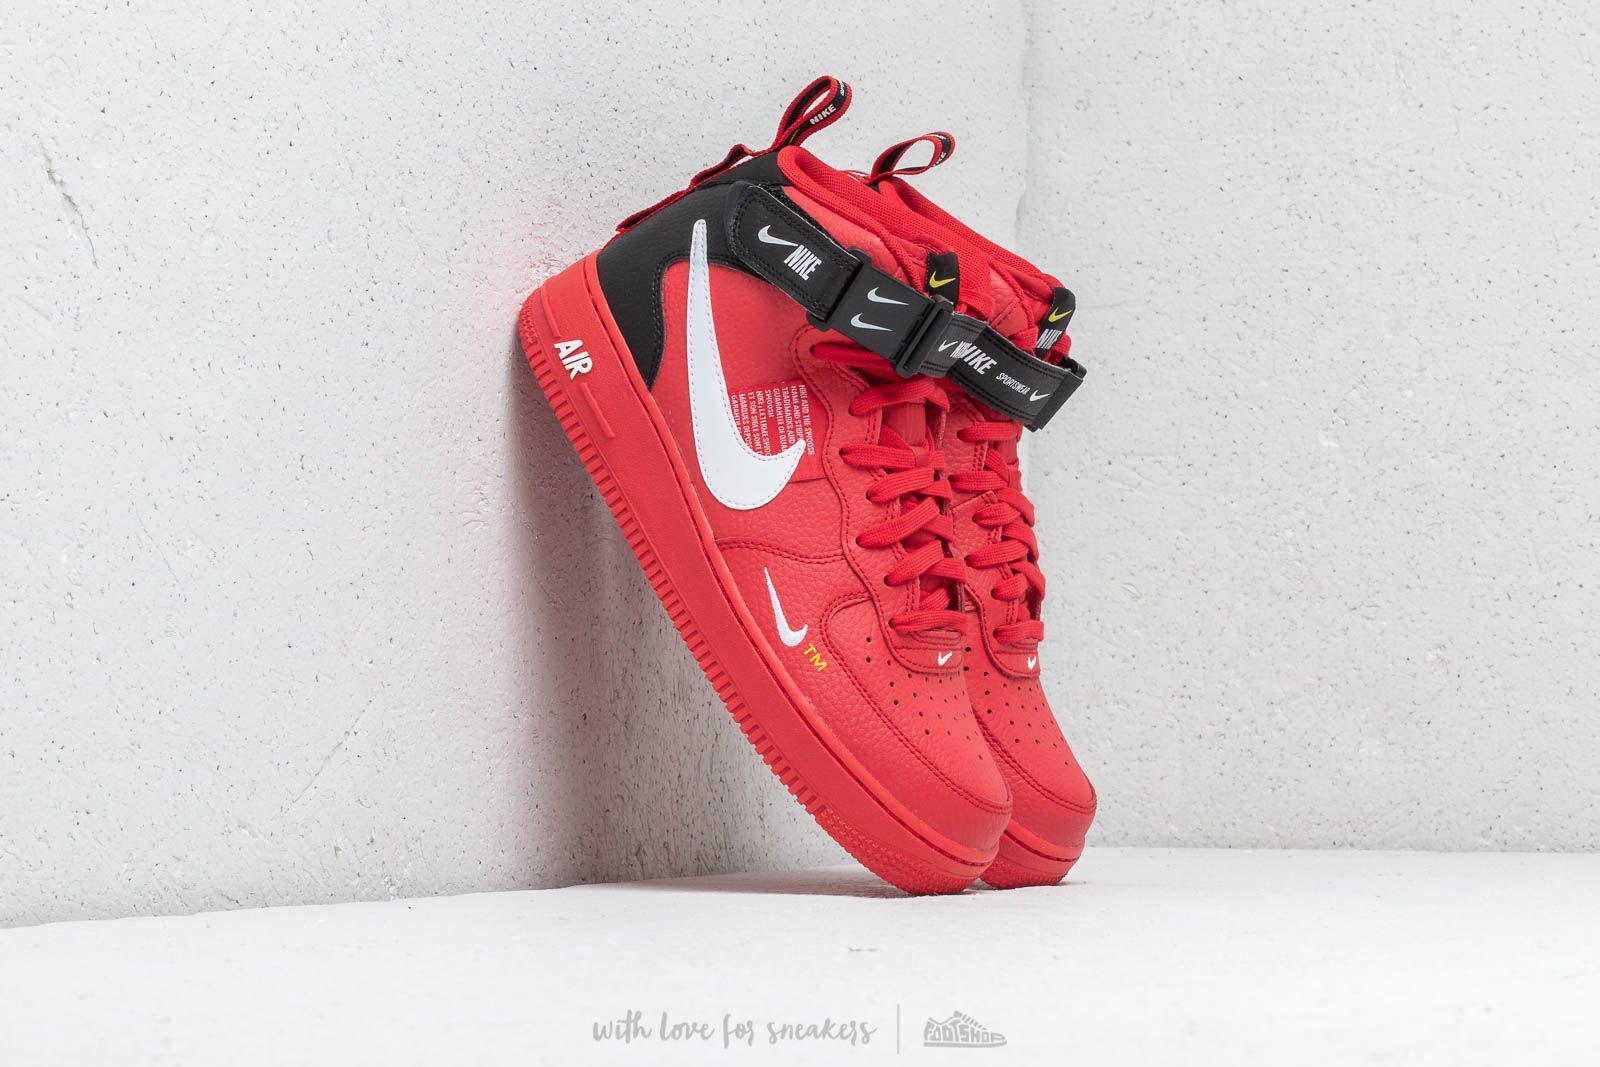 da2ea909b15 Lyst - Nike Air Force 1 Mid  07 Lv8 University Red  White- Black in ...